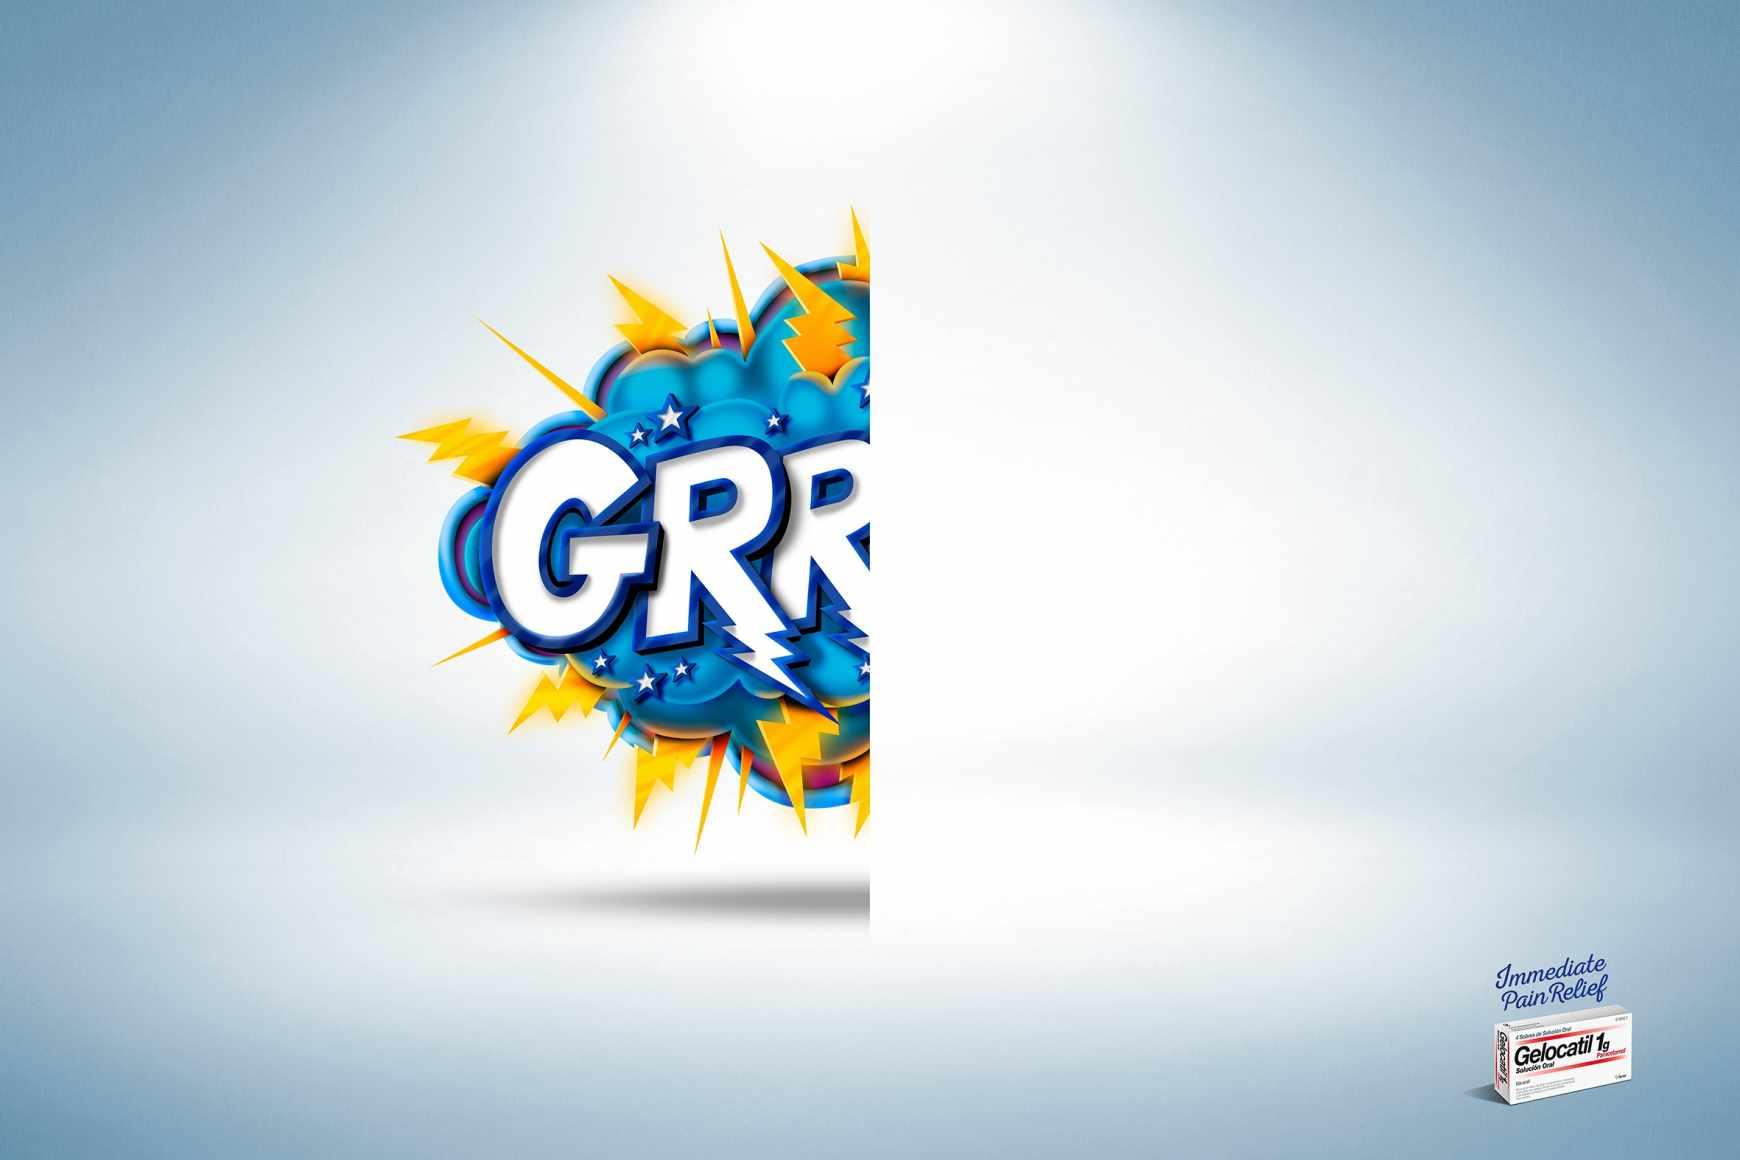 Gelocatil Grrr